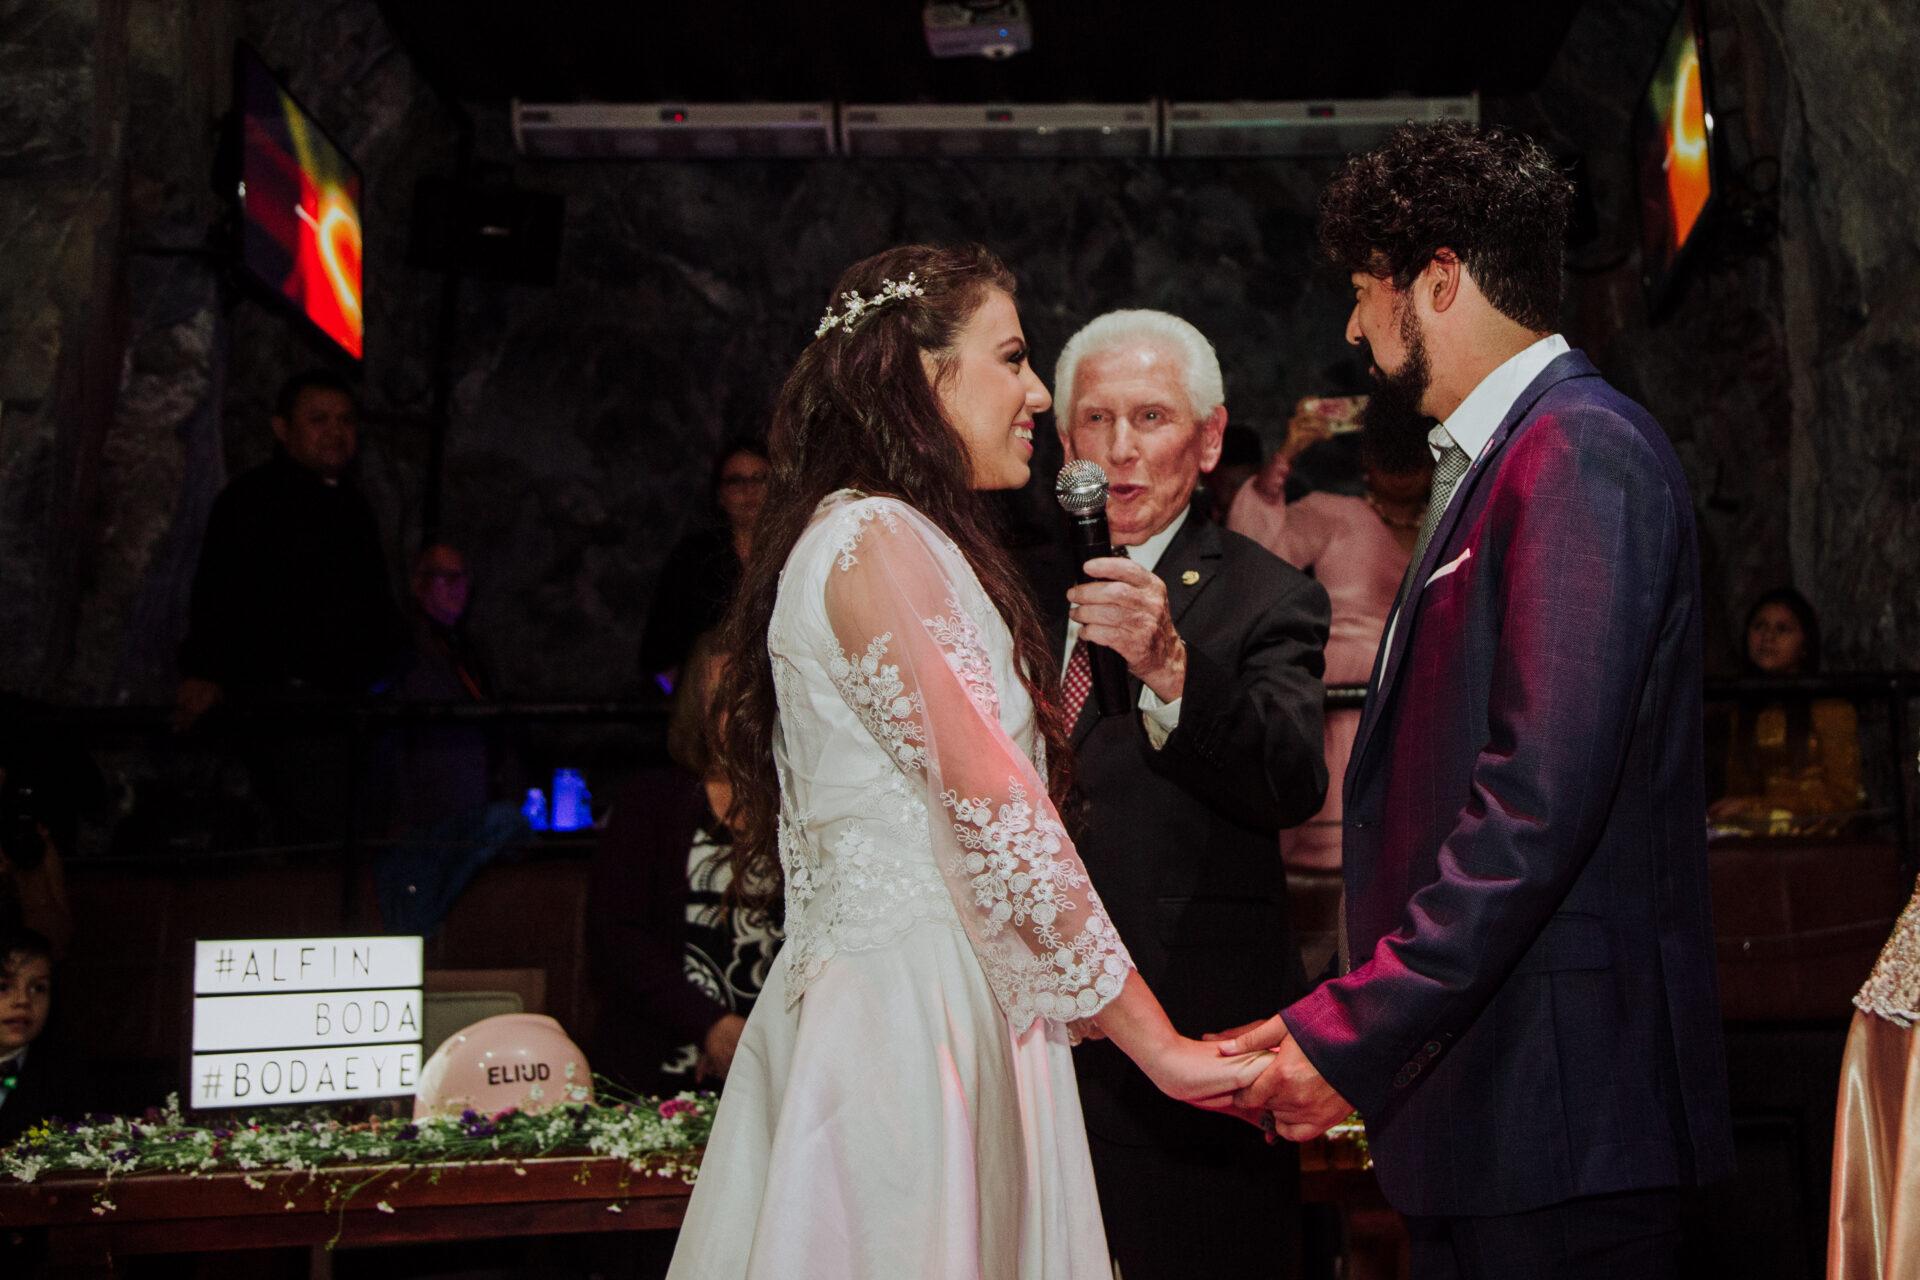 javier_noriega_fotografo_bodas_la_mina_club_zacatecas_wedding_photographer11